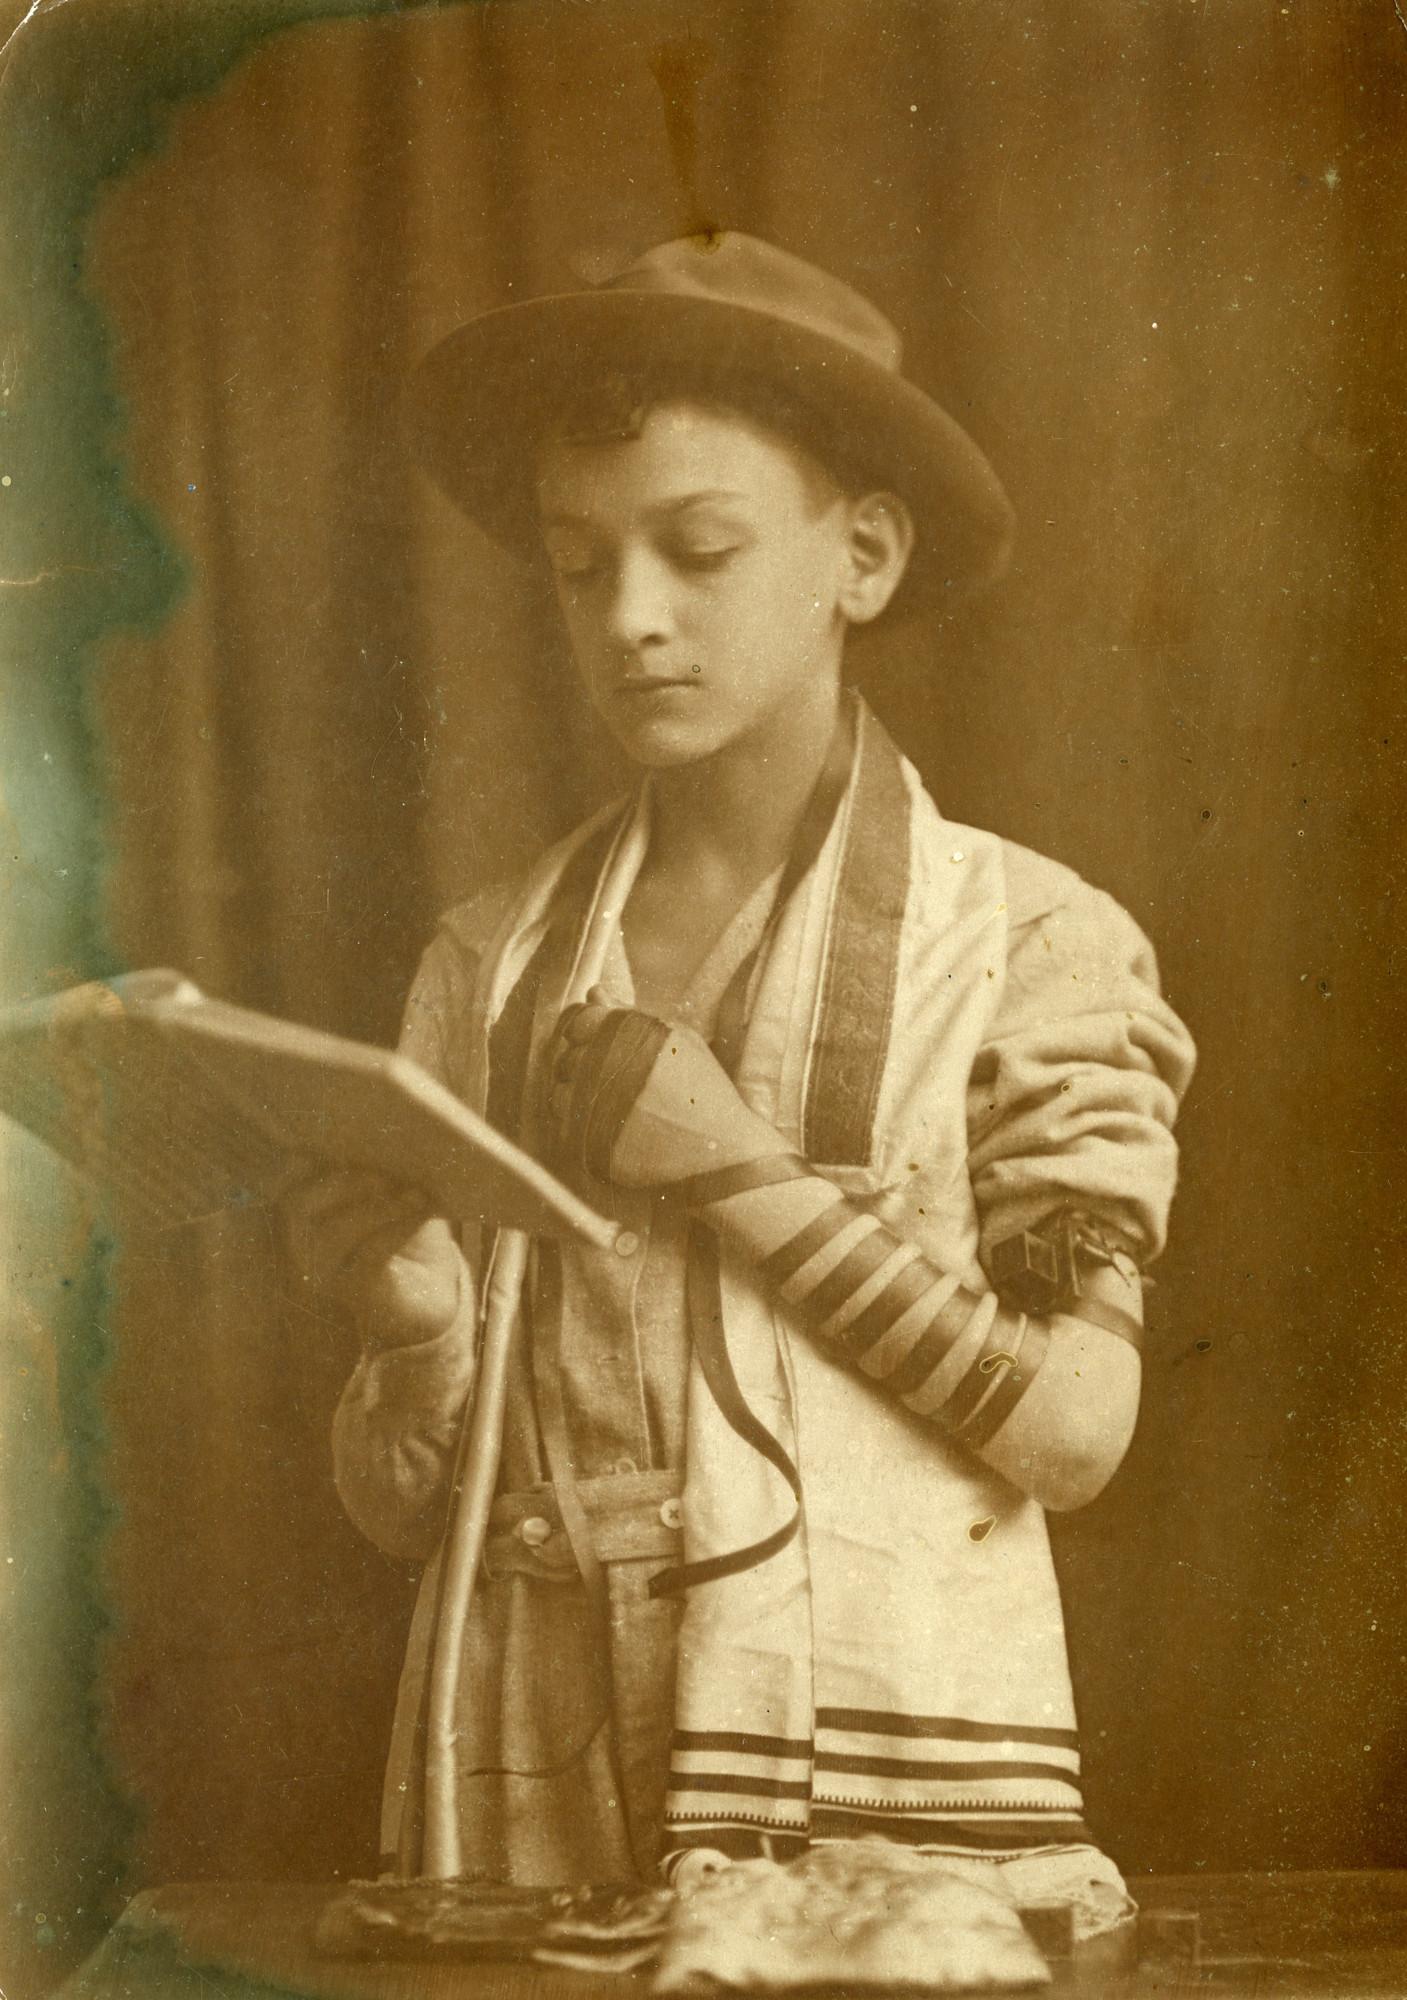 Moni Gelehrter, wrapped in tallis and tefillin, at his bar mitzvah in Iasi.